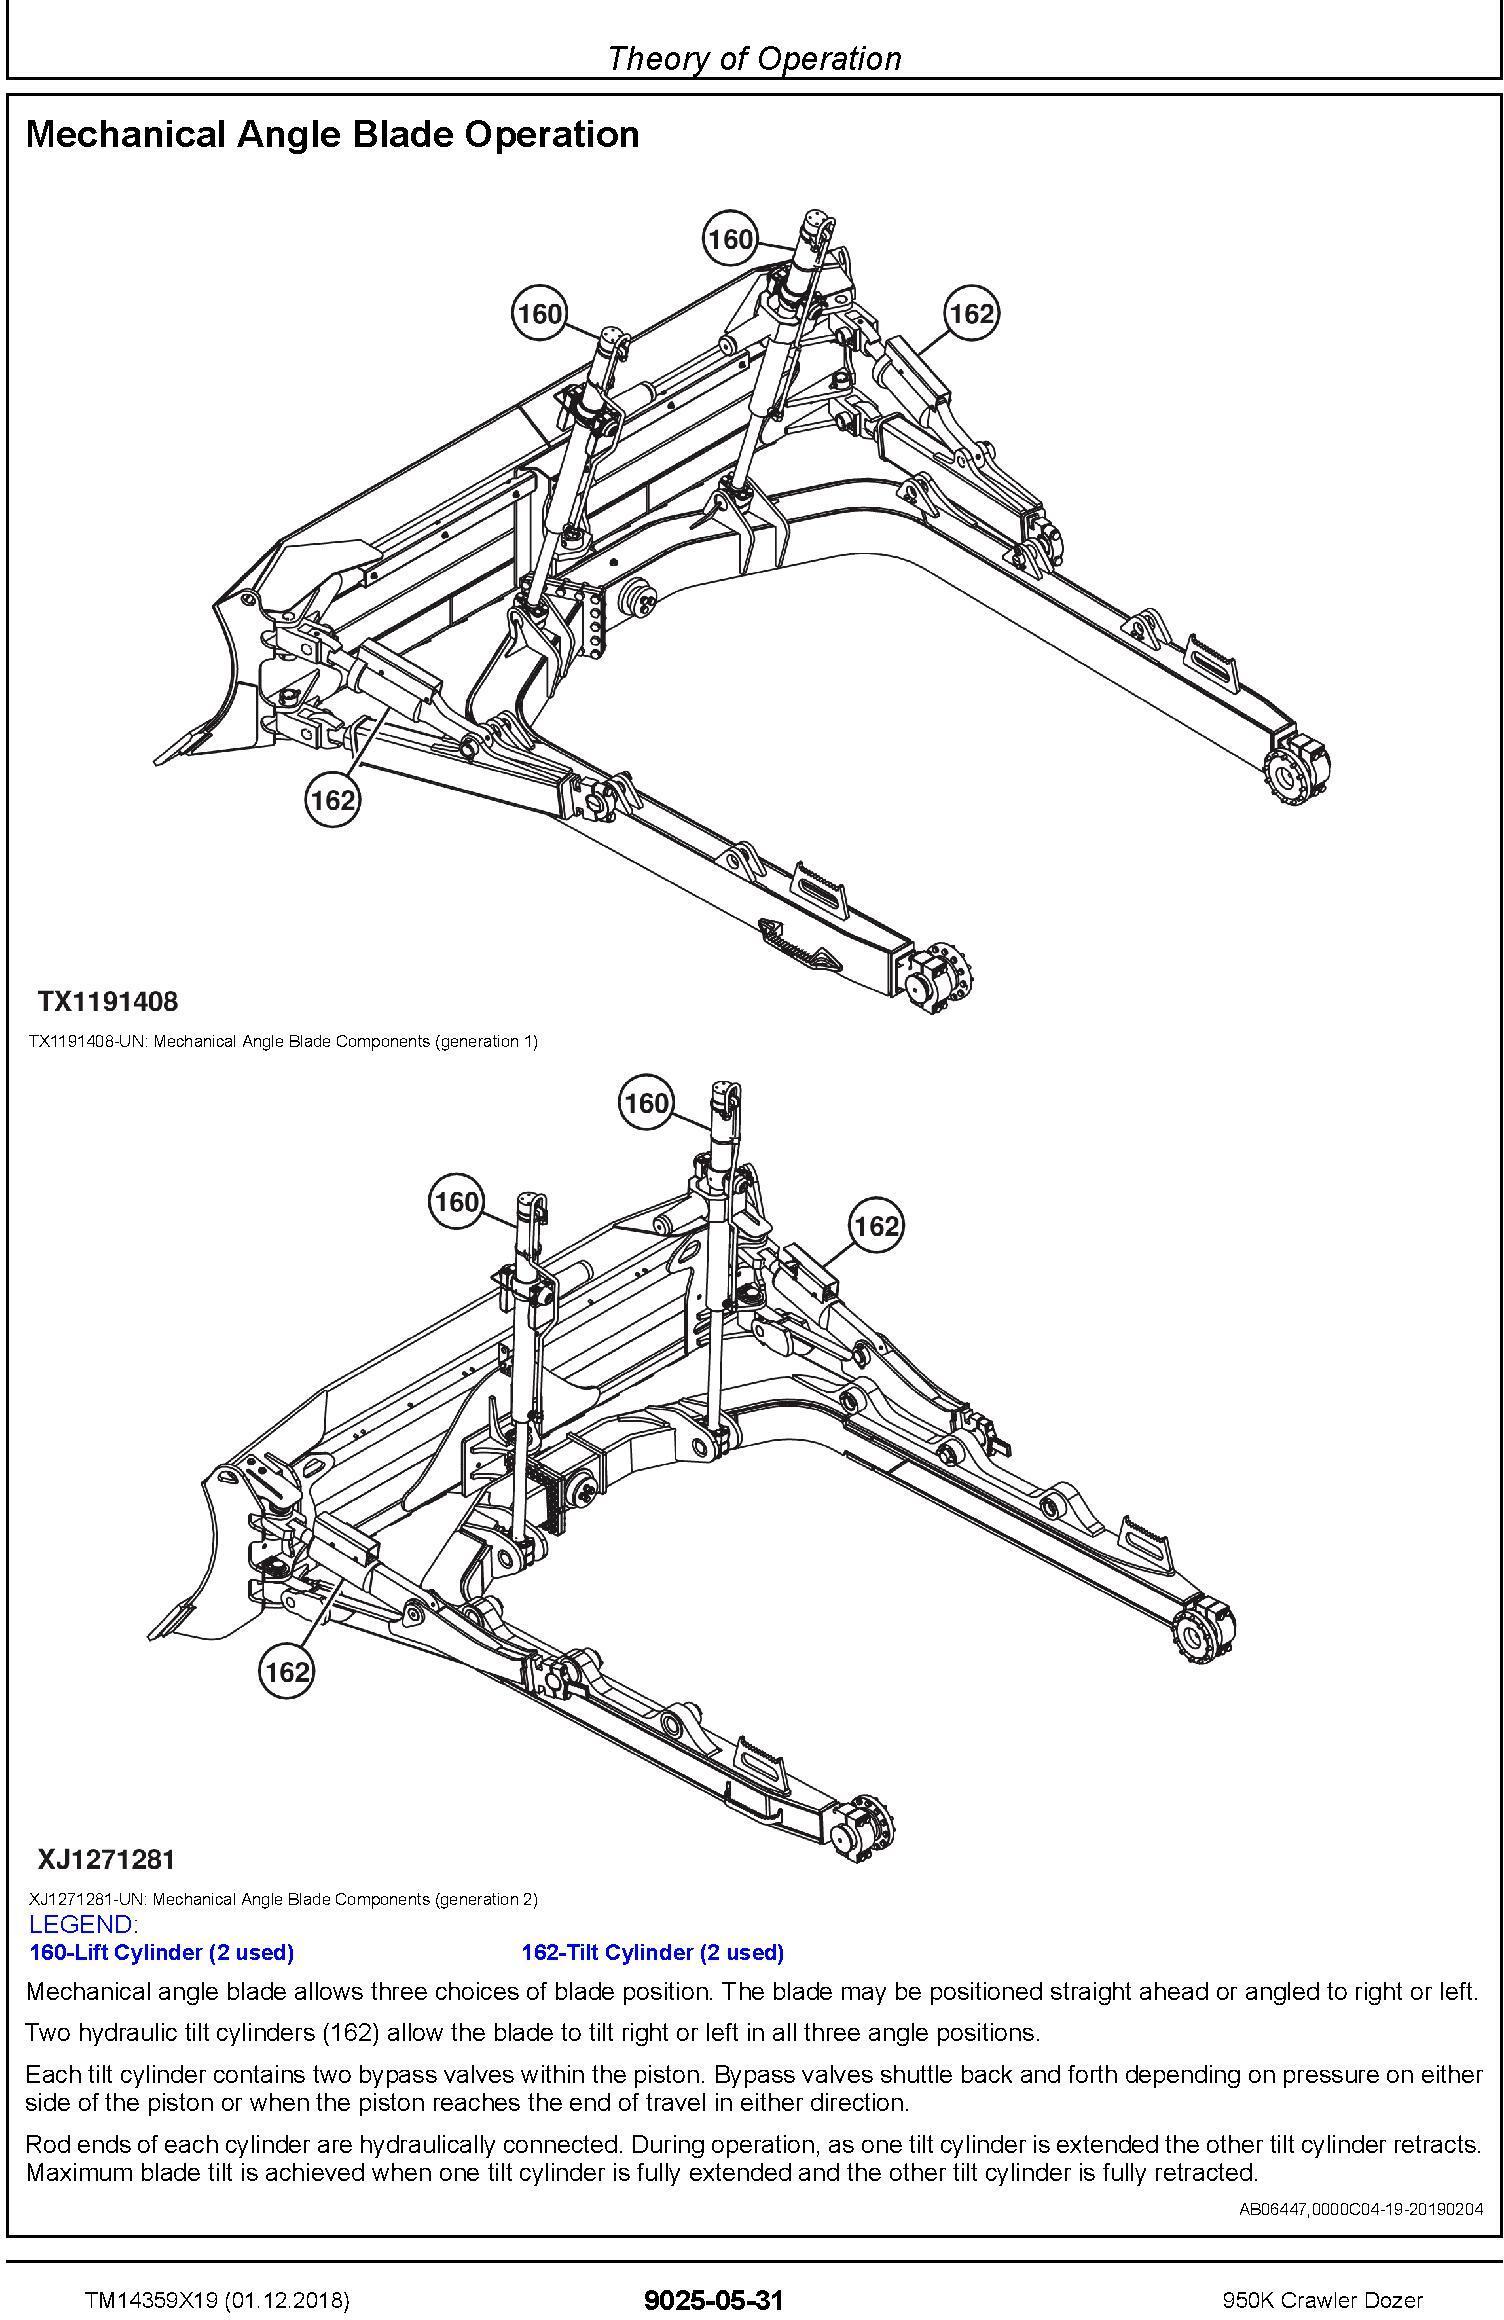 John Deere 950K Crawler Dozer Operation & Test Technical Manual (TM14359X19) - 3